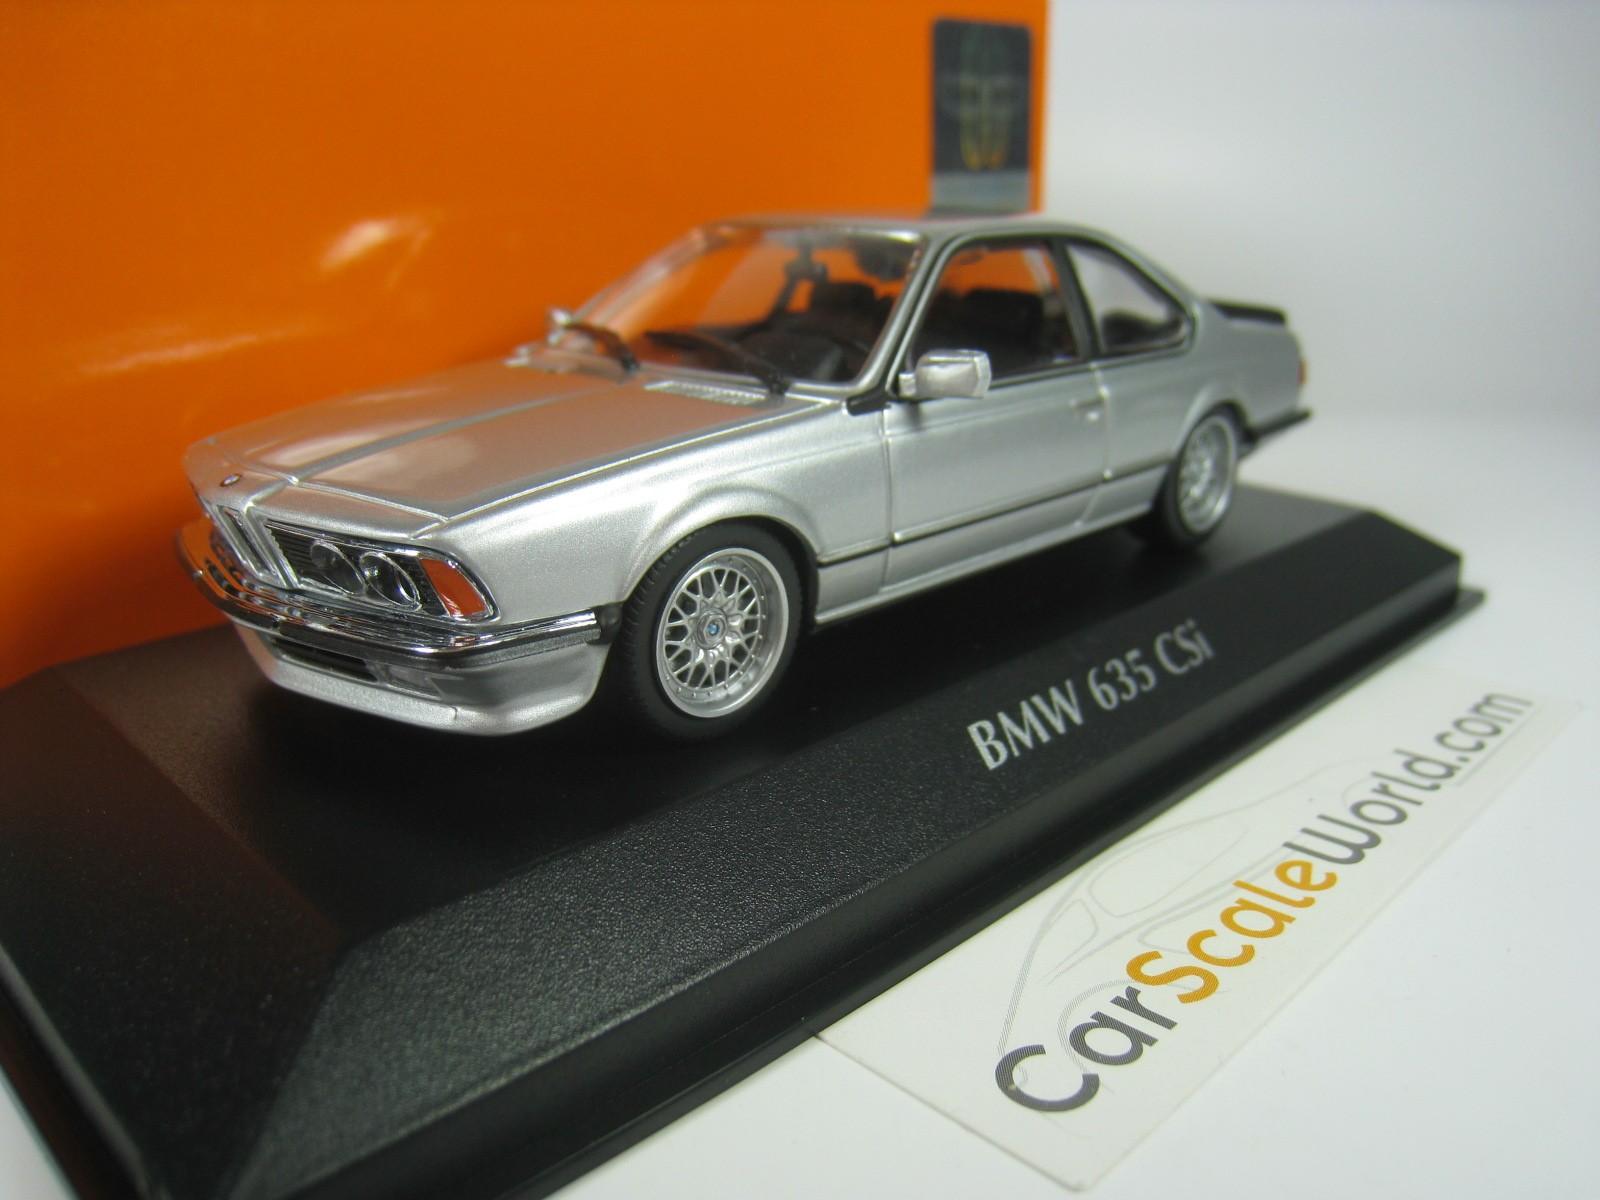 Bmw 635 Csi E24 1982 143 Maxichamps Silver Carscaleworld